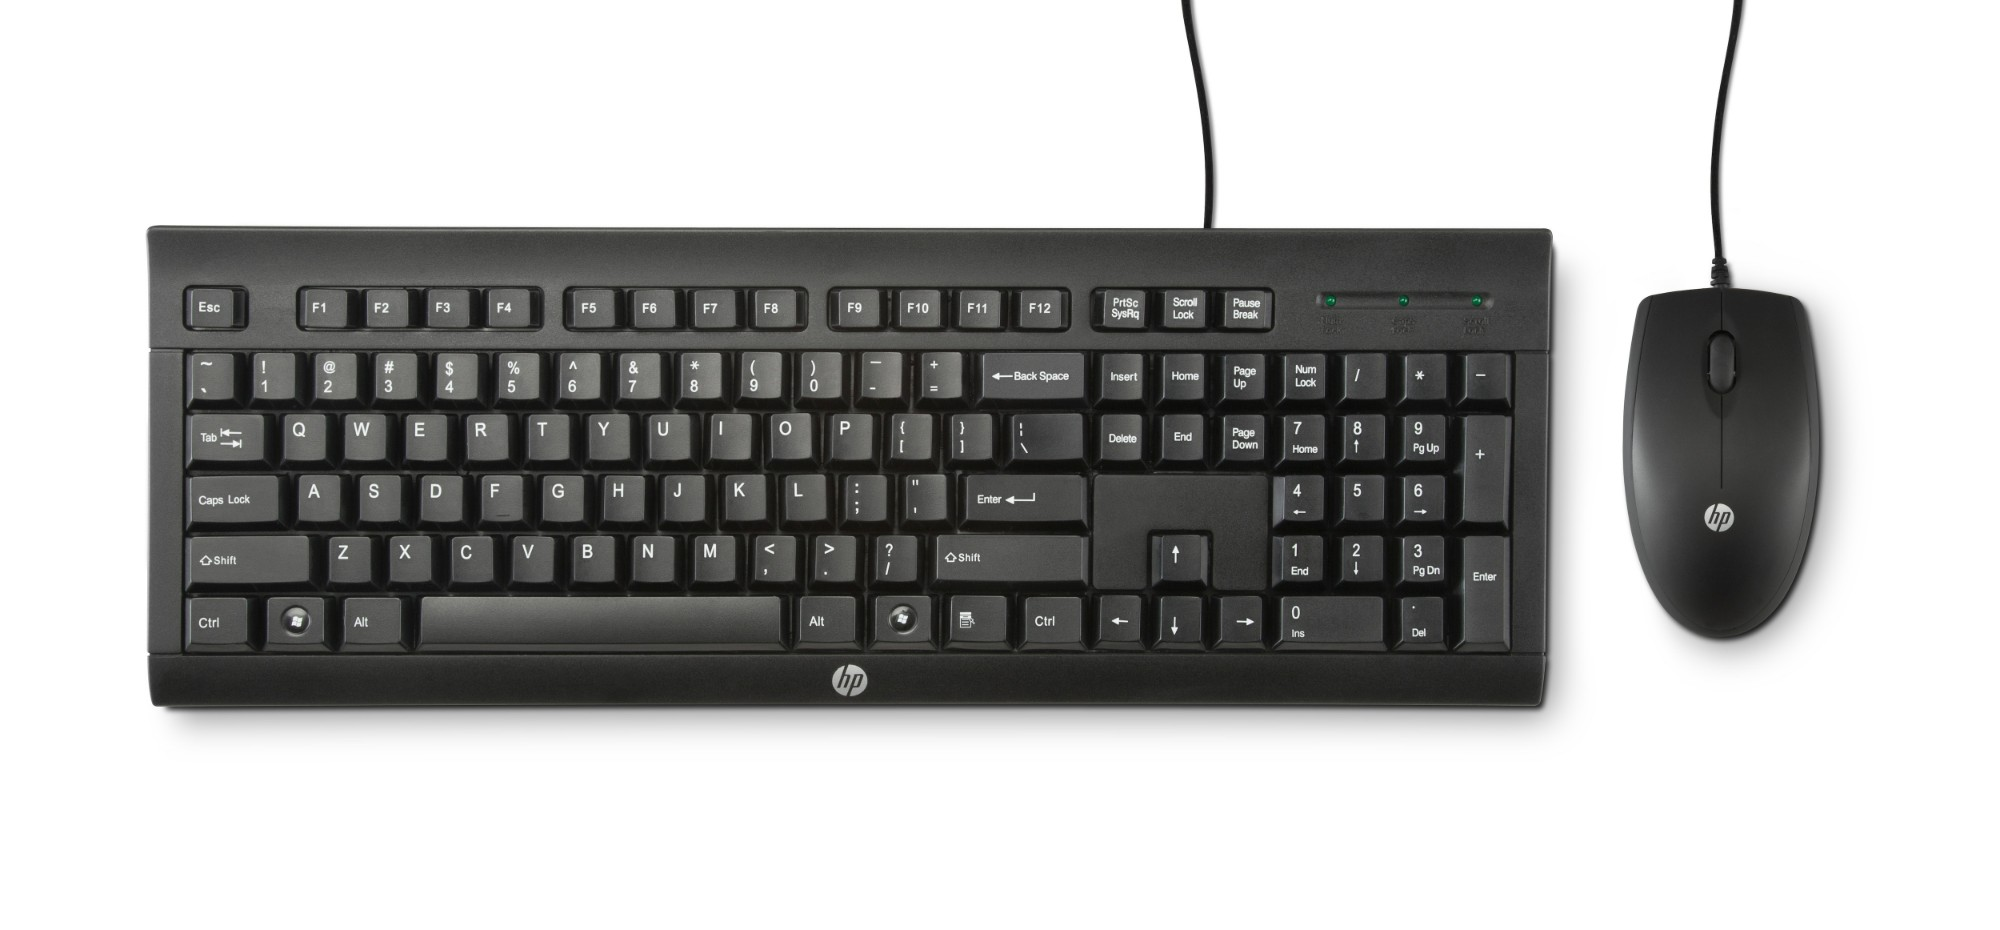 Keyboard and Mouse Kits UK